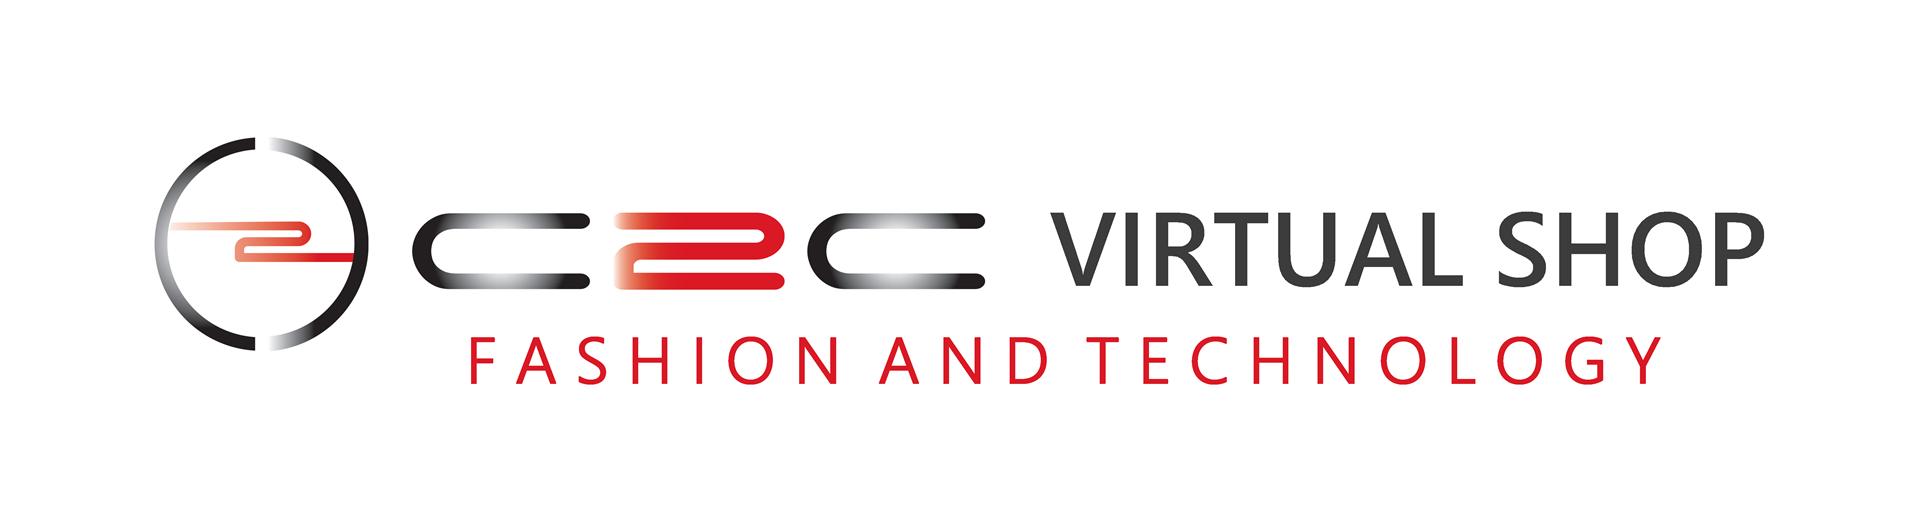 C2C Virtual Shop